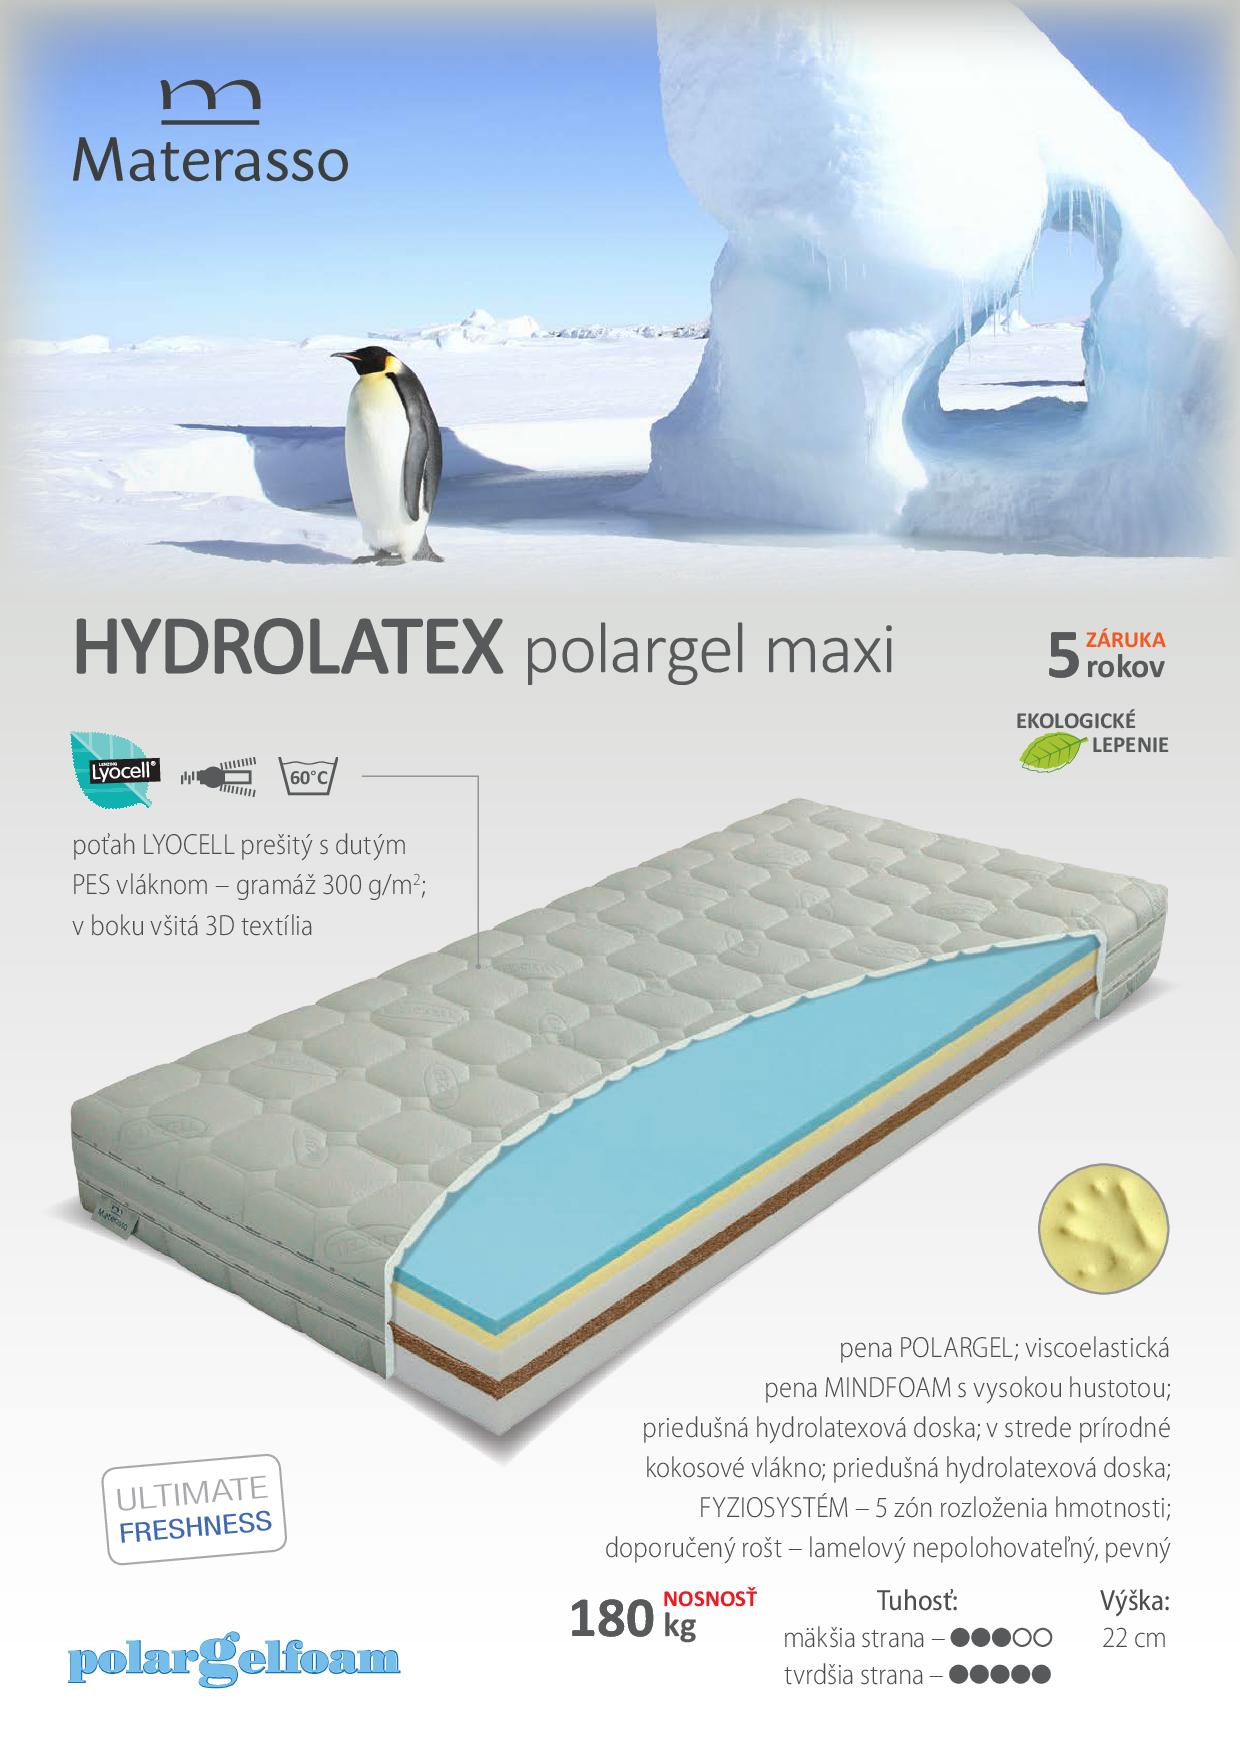 Hydrolax Polargel maxi